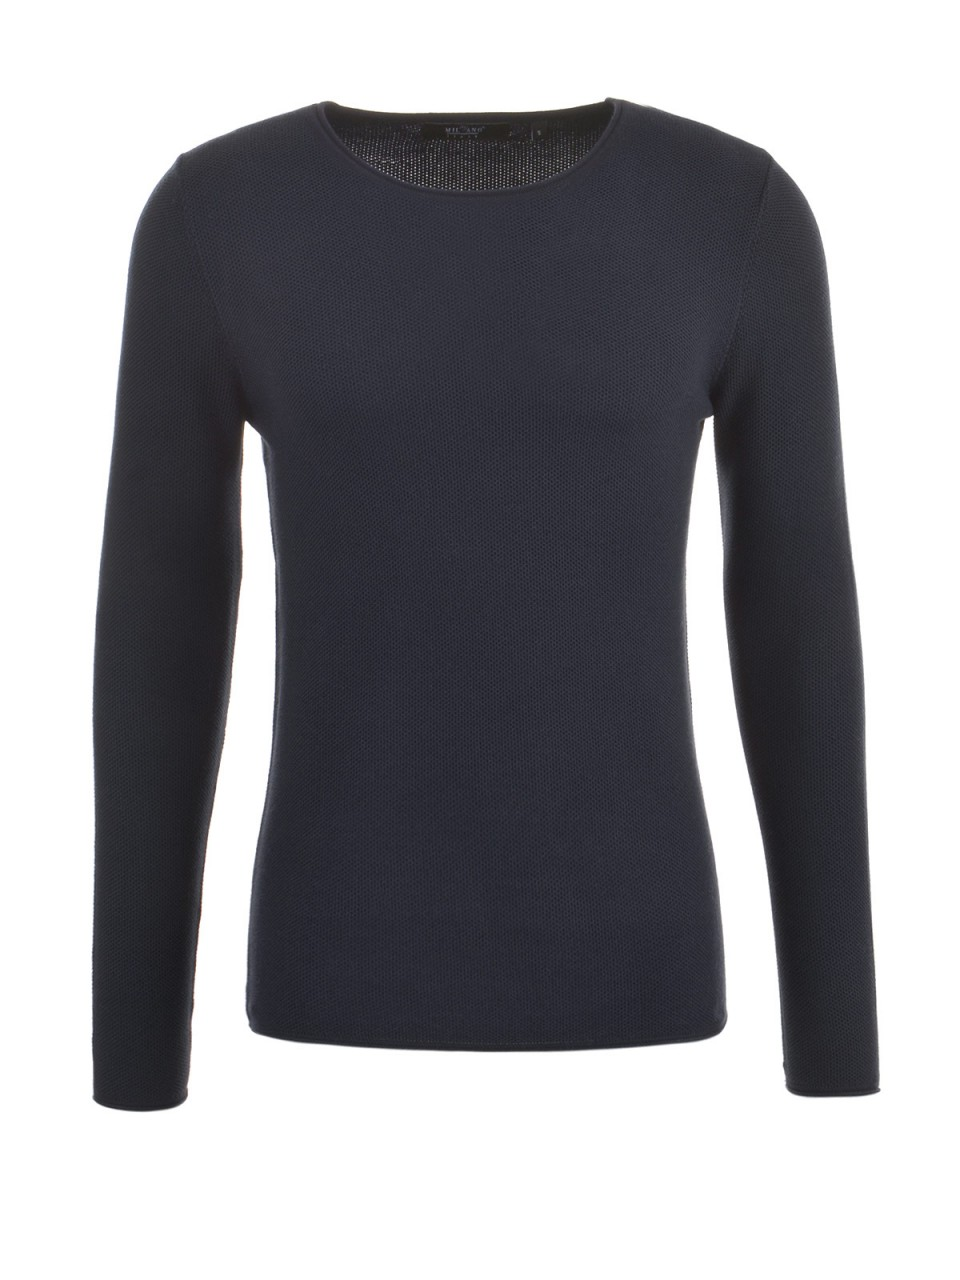 milano-italy-herren-pullover-nachtblau